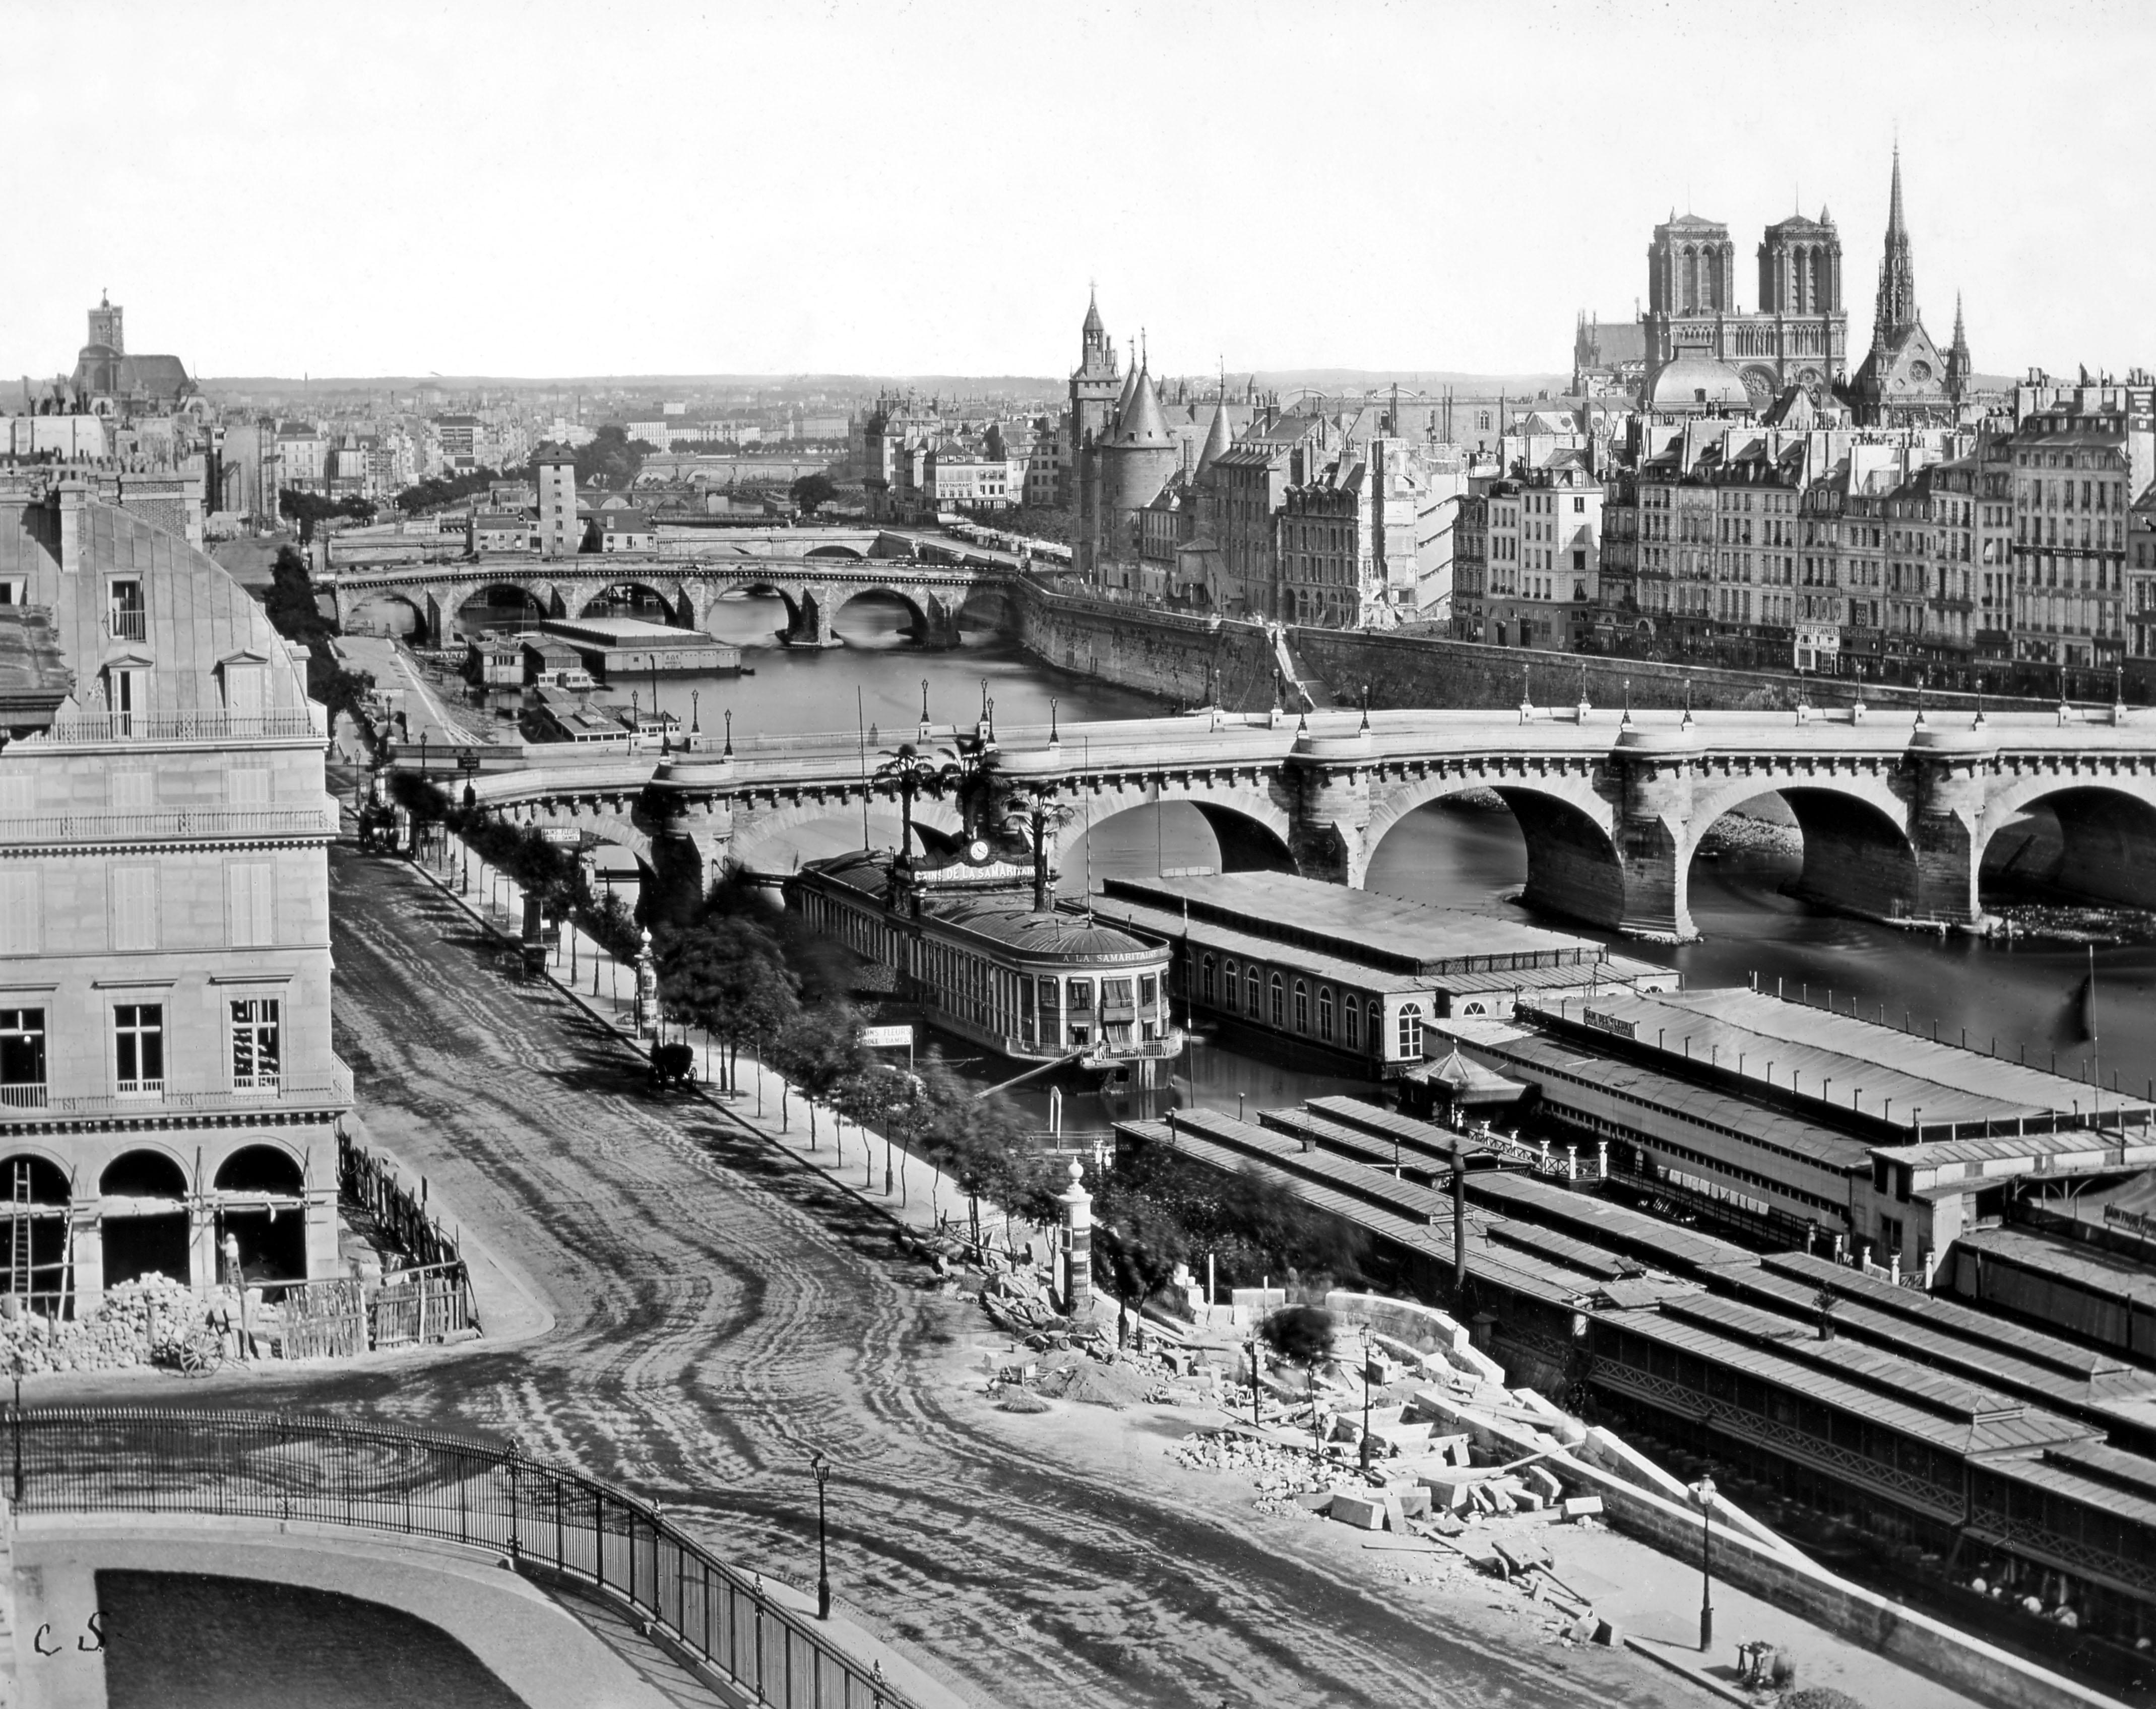 502 Paris 'Panorama de Paris pris du Louvre' C